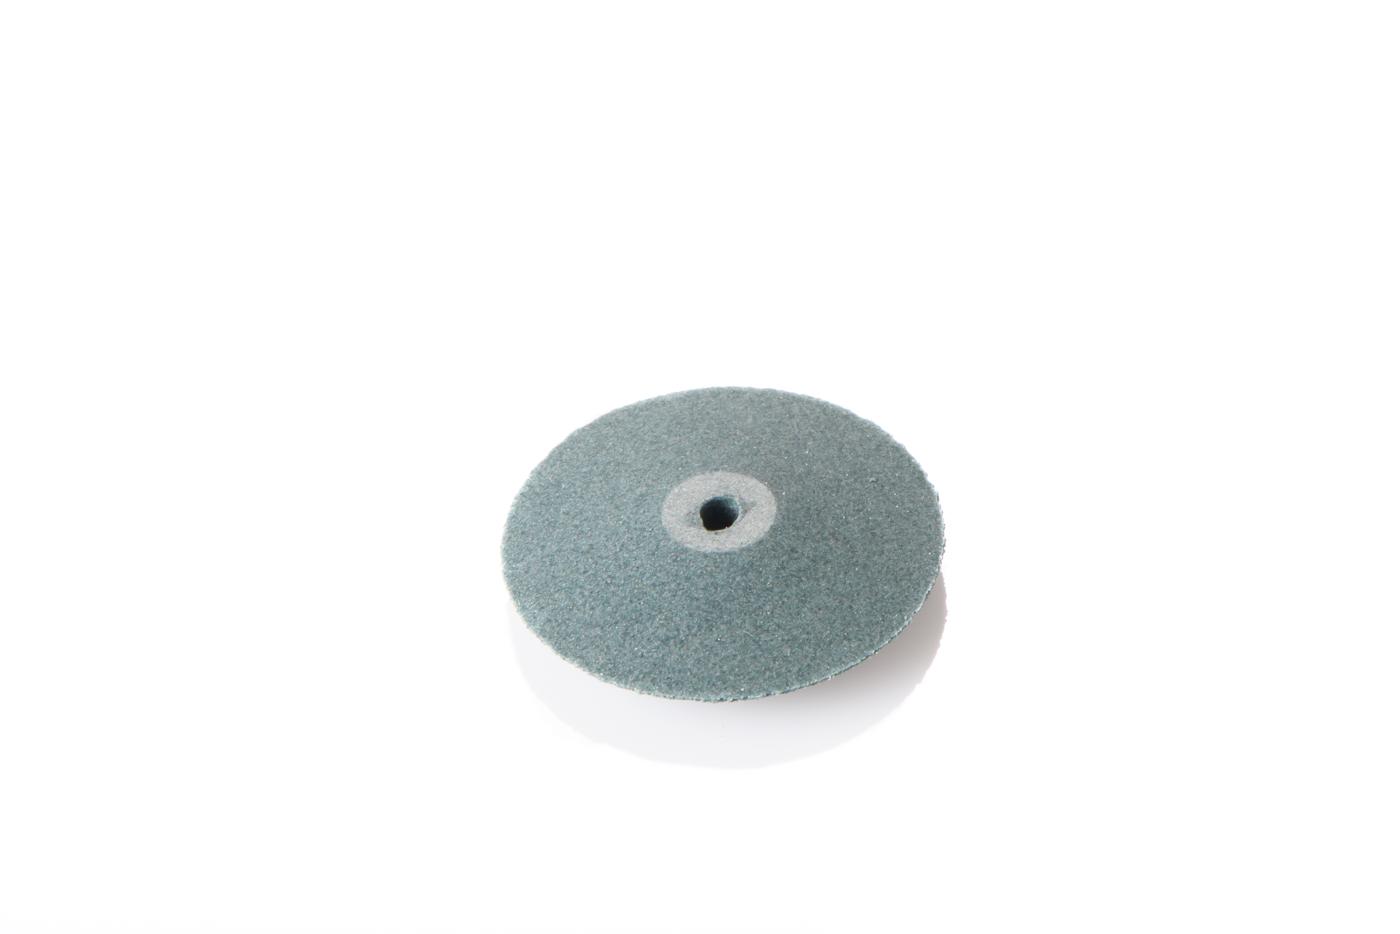 Pacific Abrasives Silicone Carbide Knife Edge Wheels, 7/8